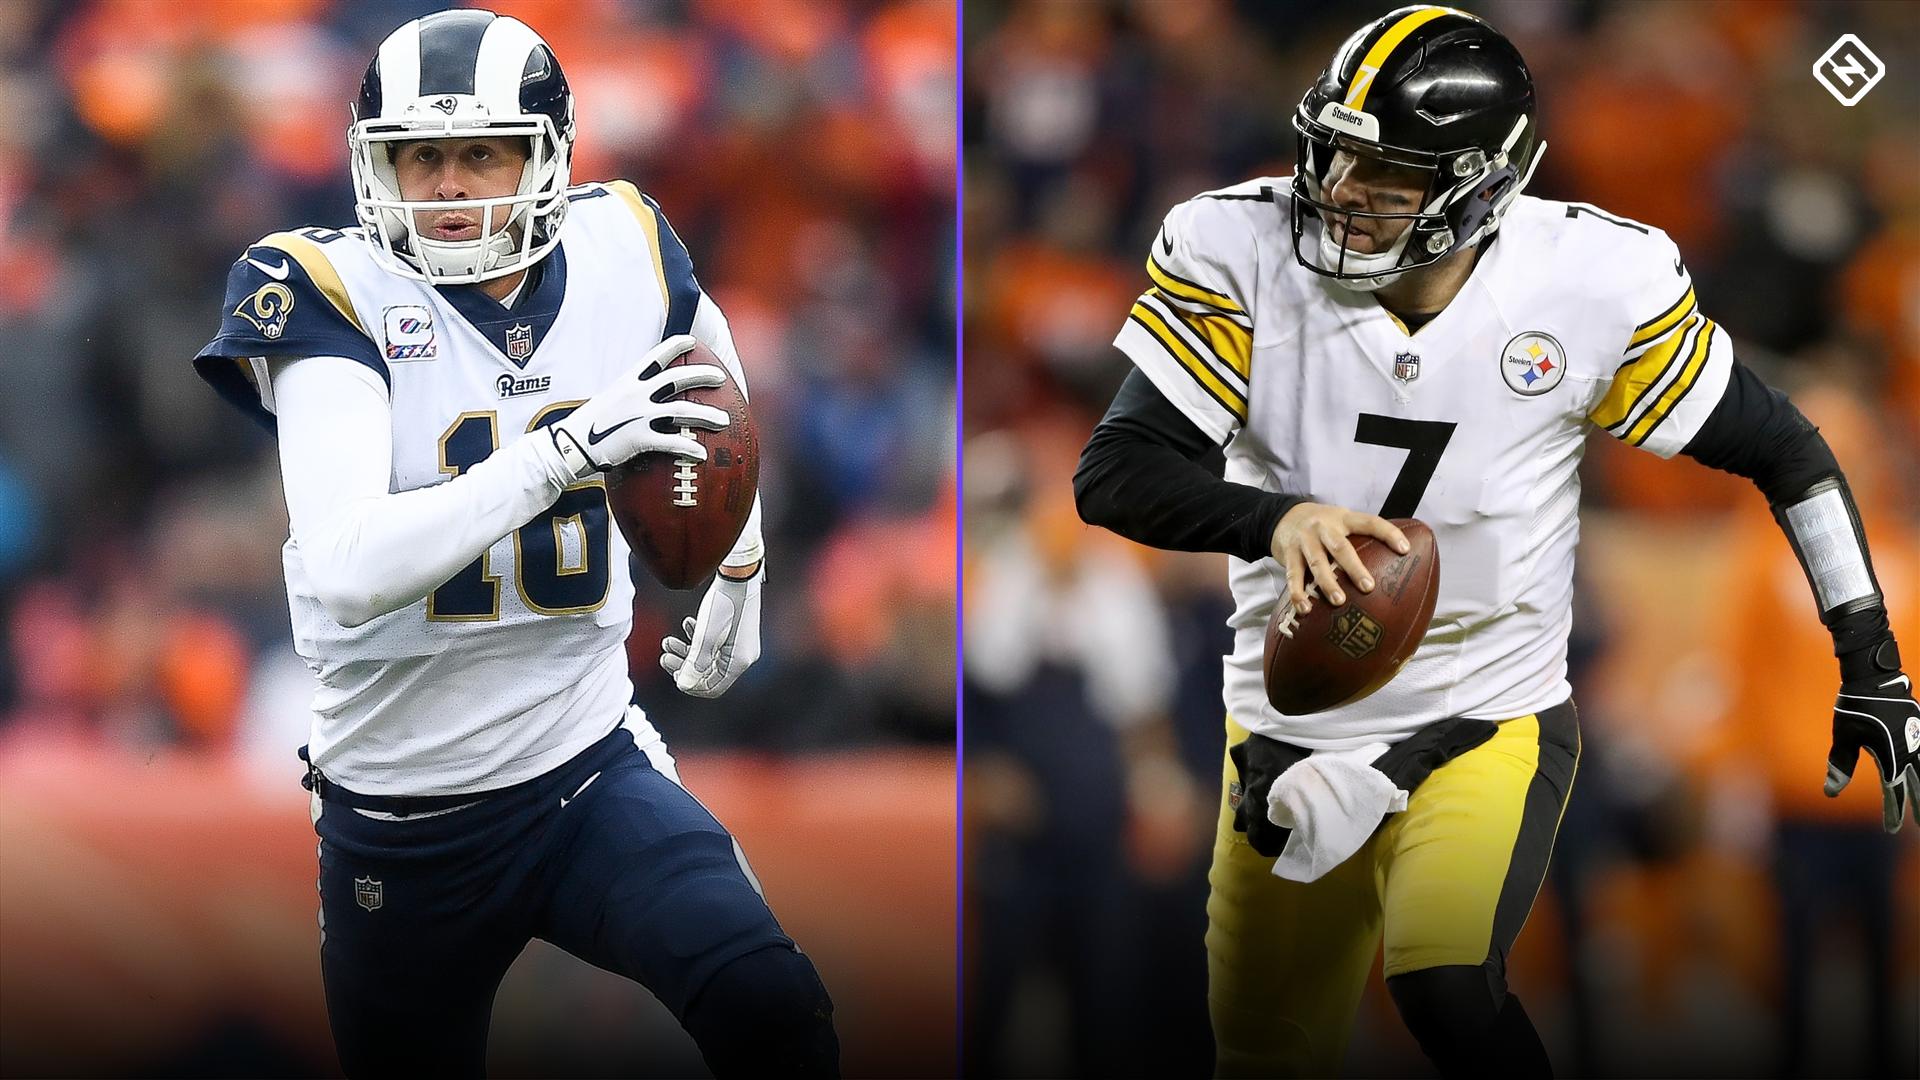 Fantasy Football Start 'Em Sit 'Em Week 13: Jared Goff goes off; Chargers-Steelers lets down